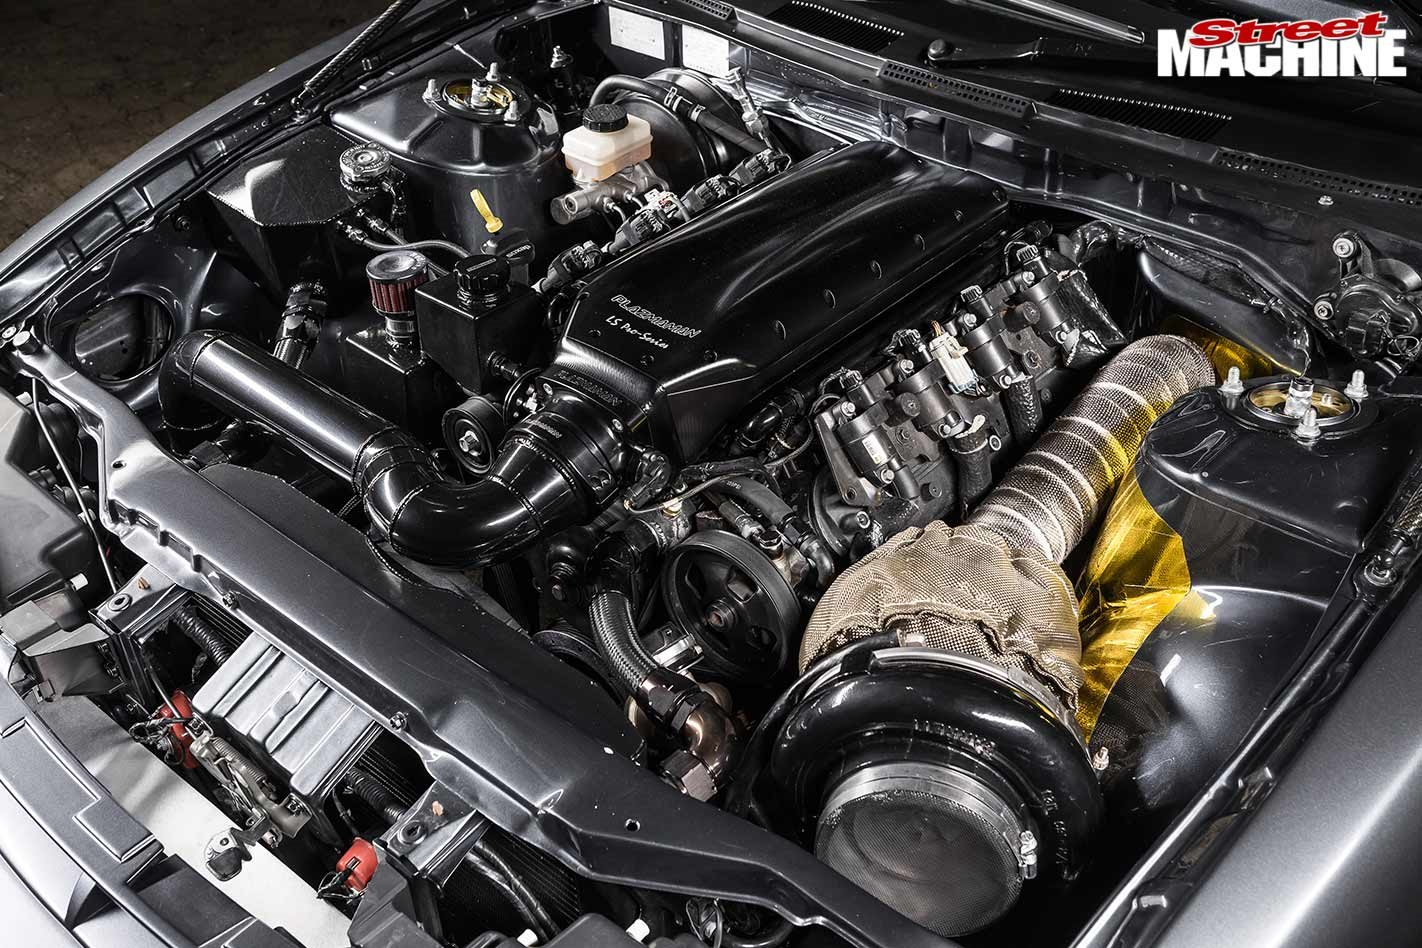 Turbo Ls3 Powered 1999 Nissan 200sx S14